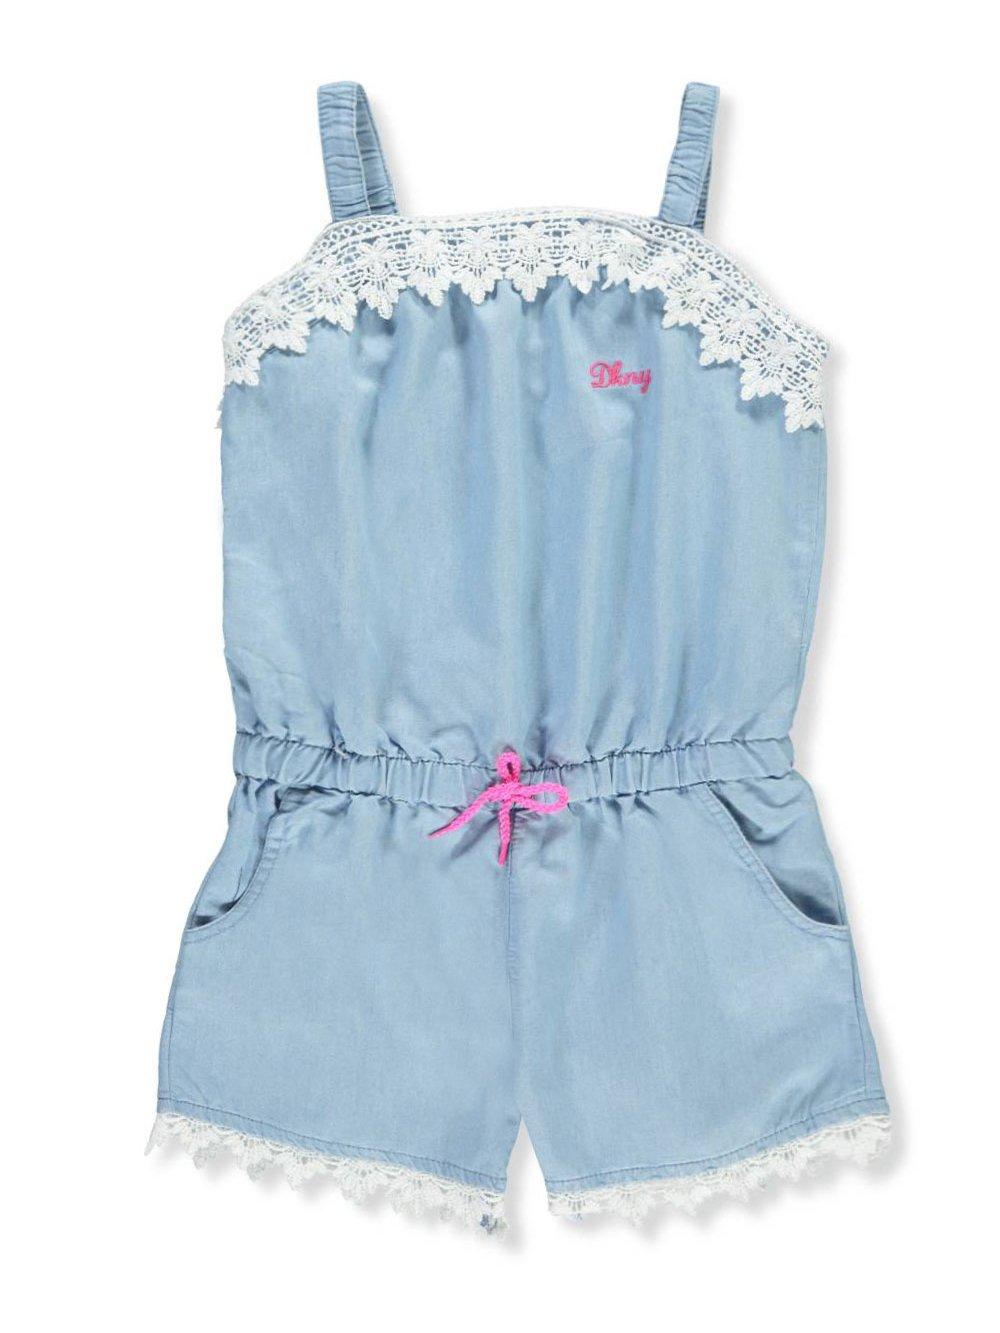 DKNY Big Girls' Romper, Crochet Trim Elastic Waist Light Wash, 10